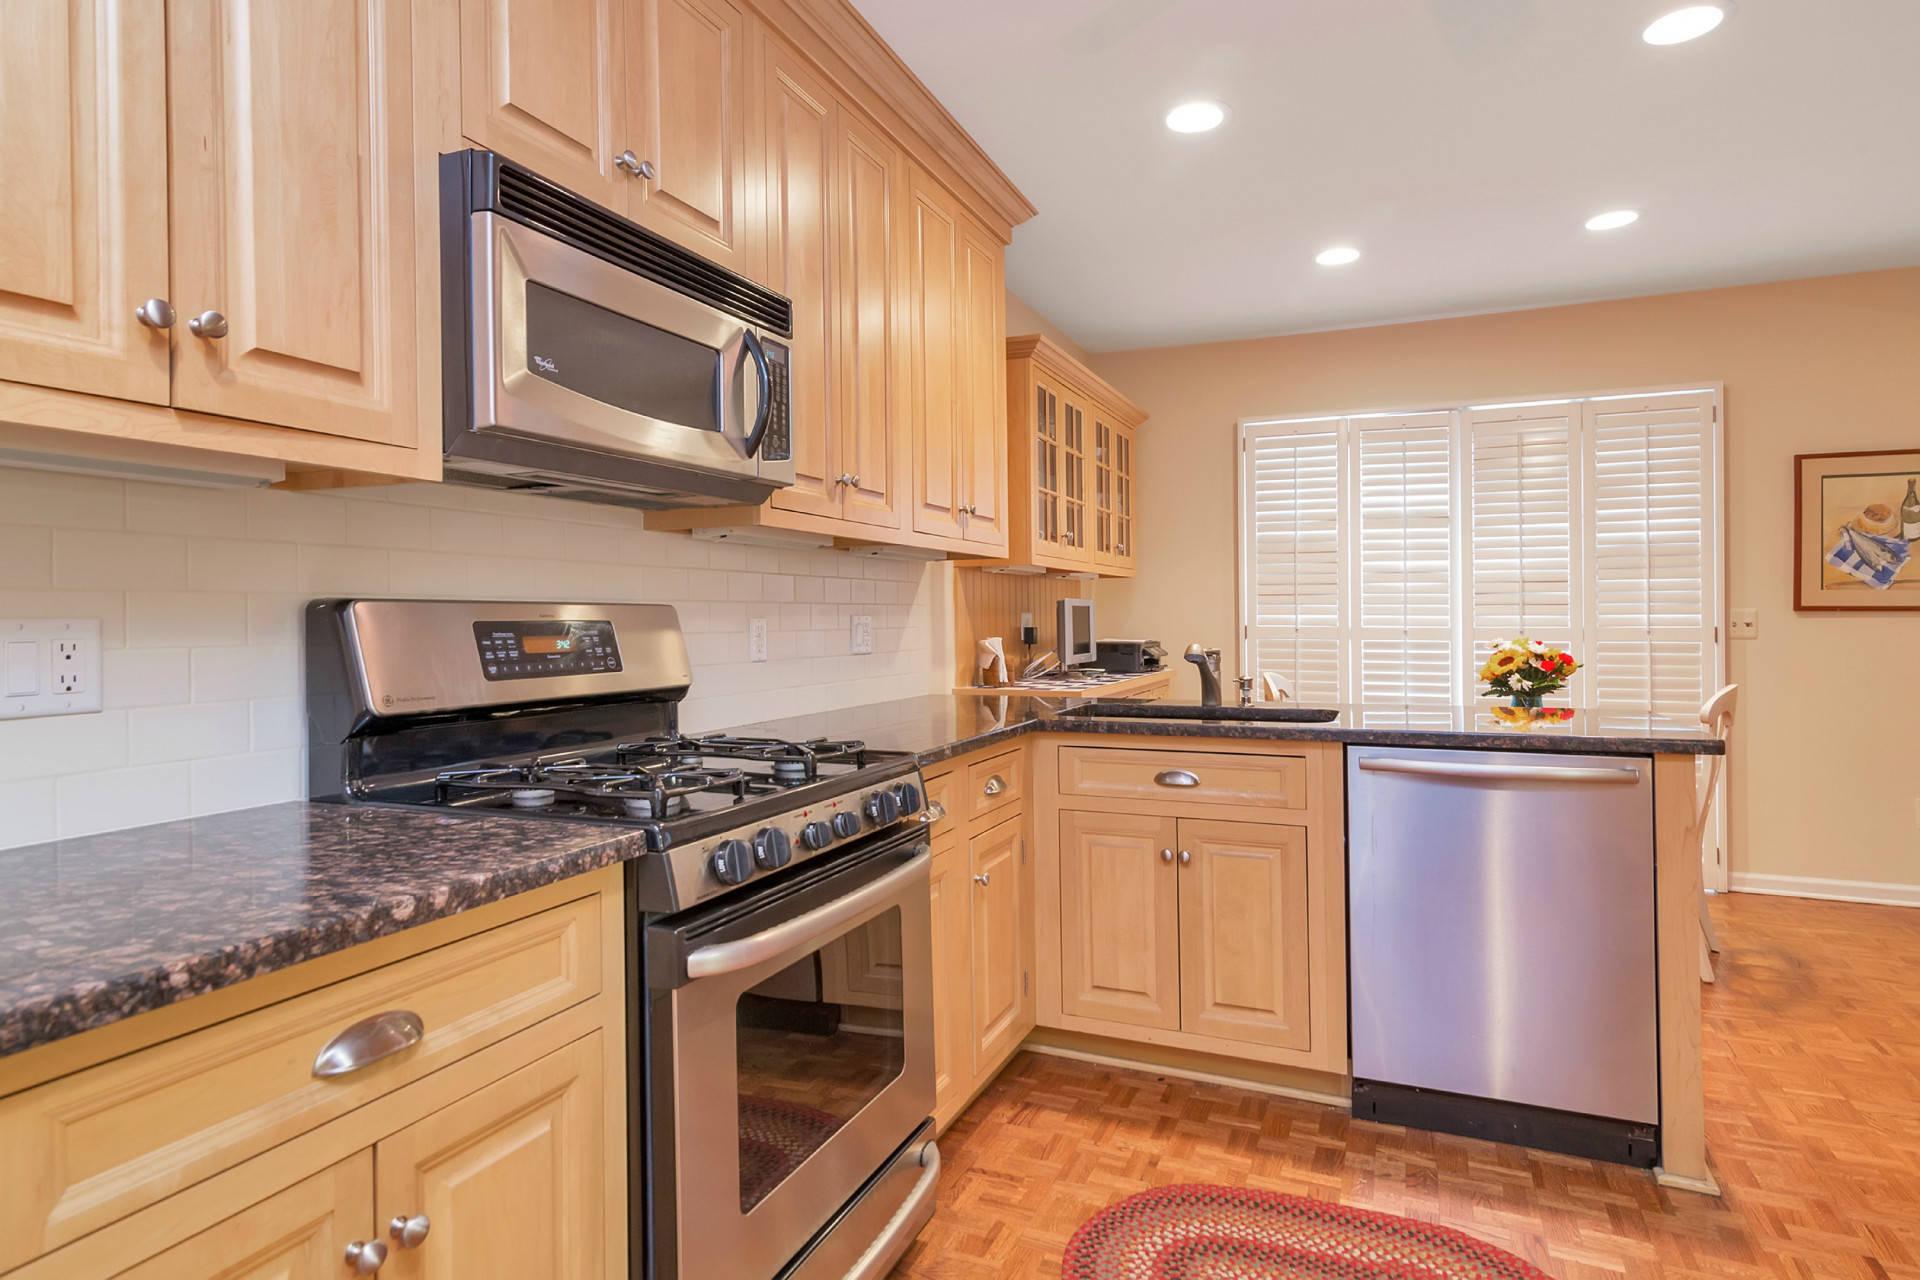 Kitchen cabinets summit nj - 008 230077 Img_9110_5054477 Jpg